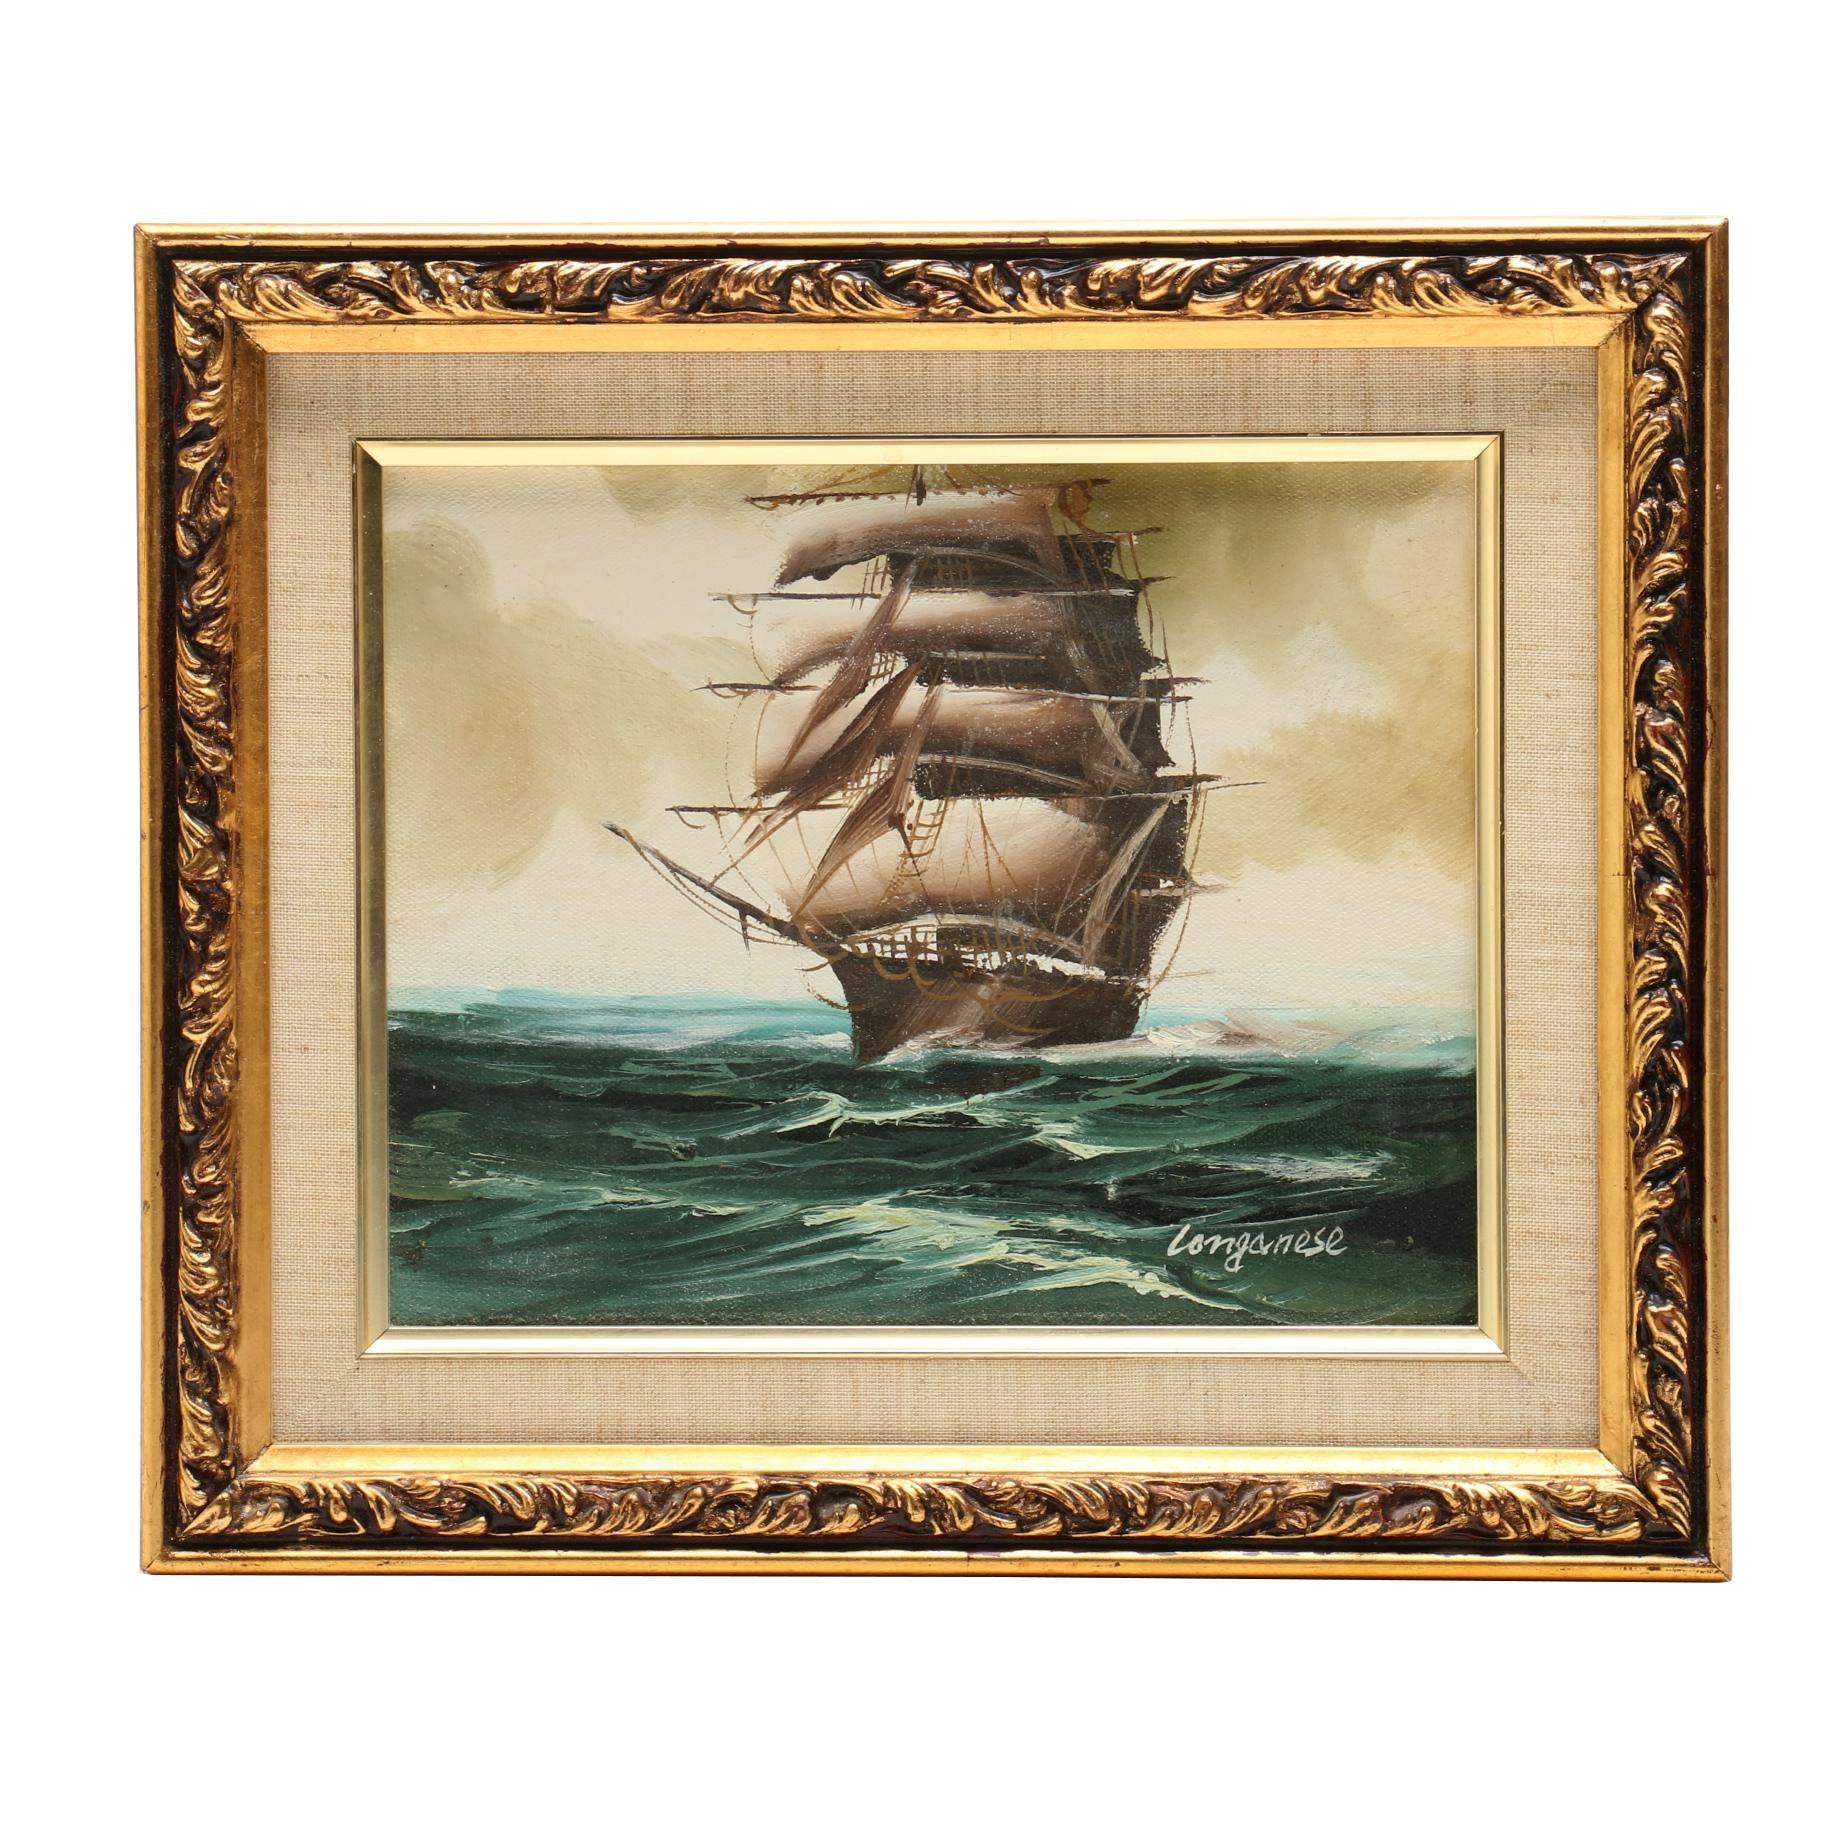 Longanese Oil Painting of Windjammer at Sea